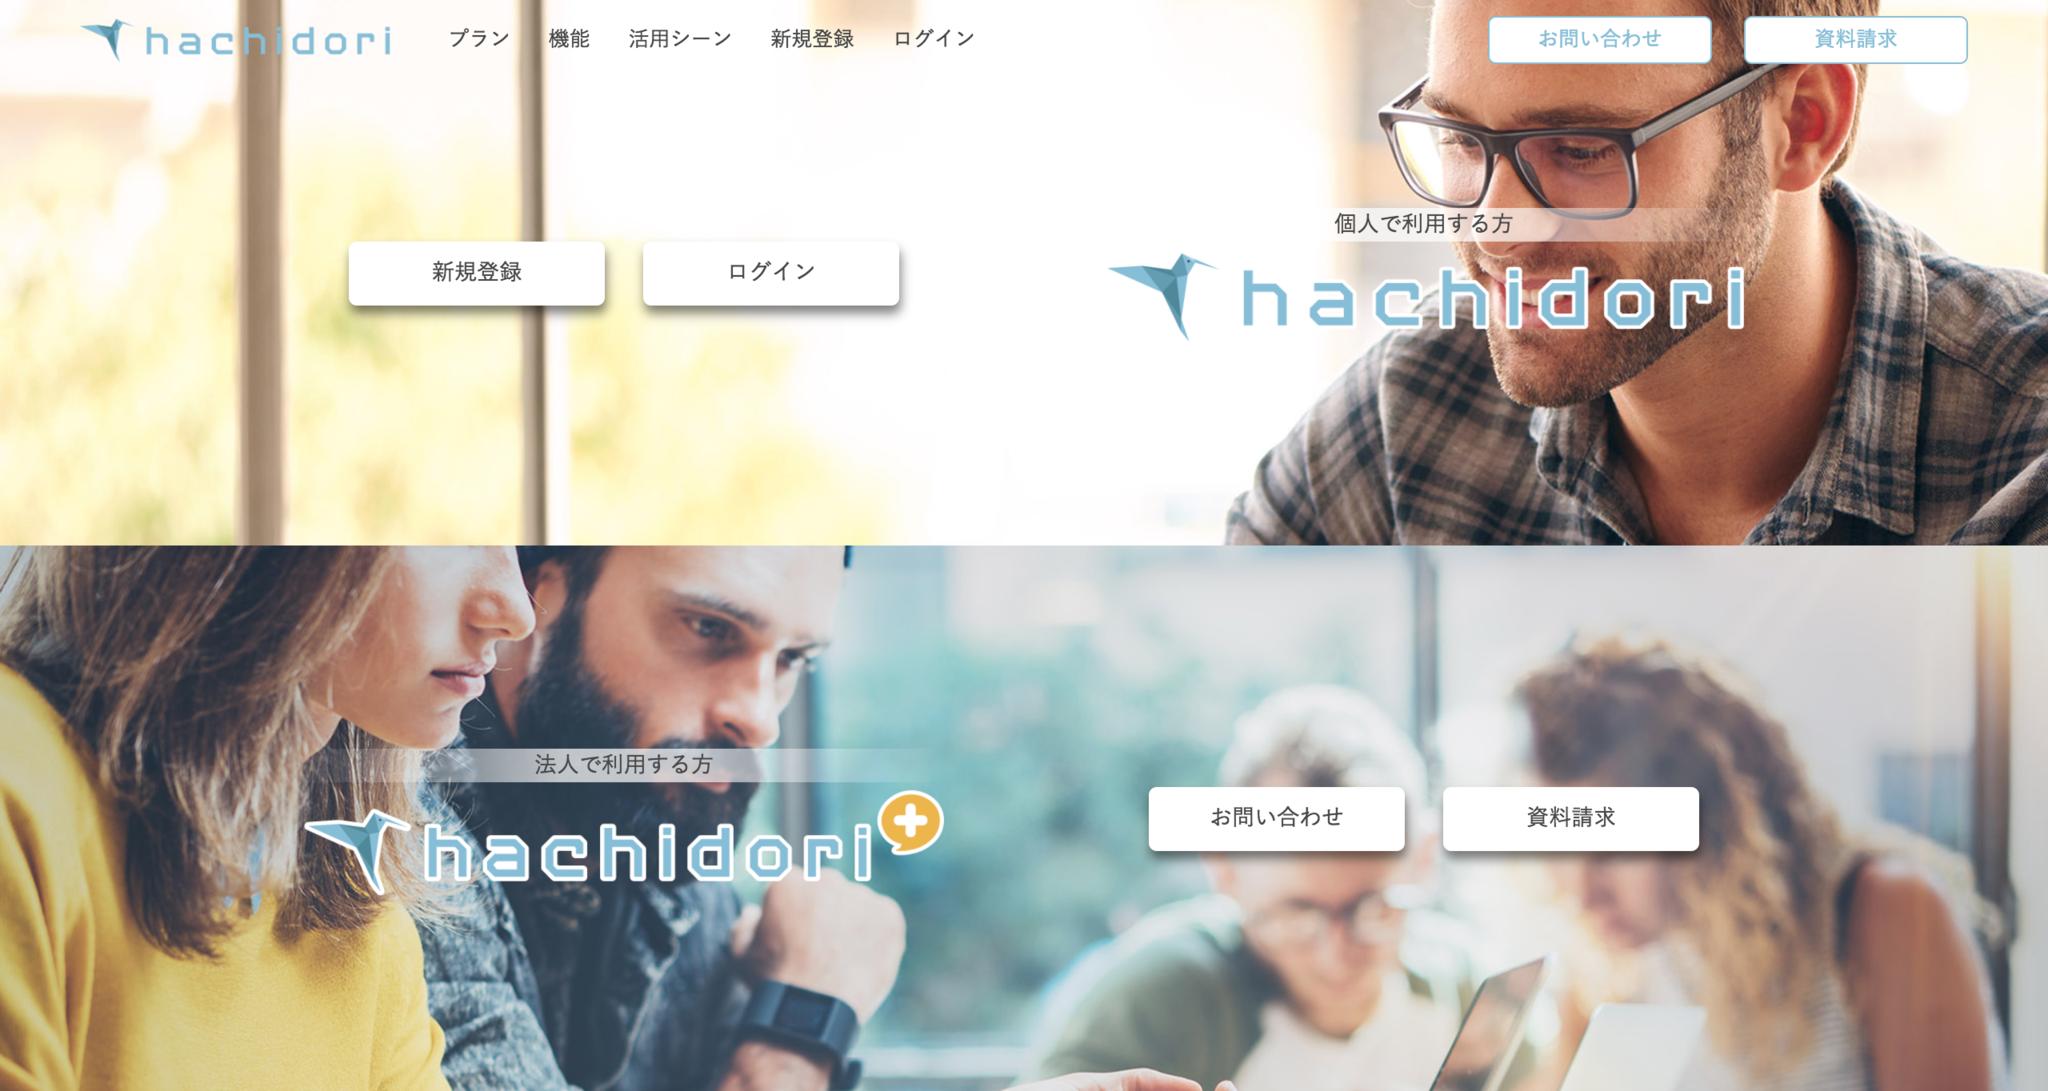 hachidori(ハチドリ)__プログラミング不要のチャットボット開発ツール.png